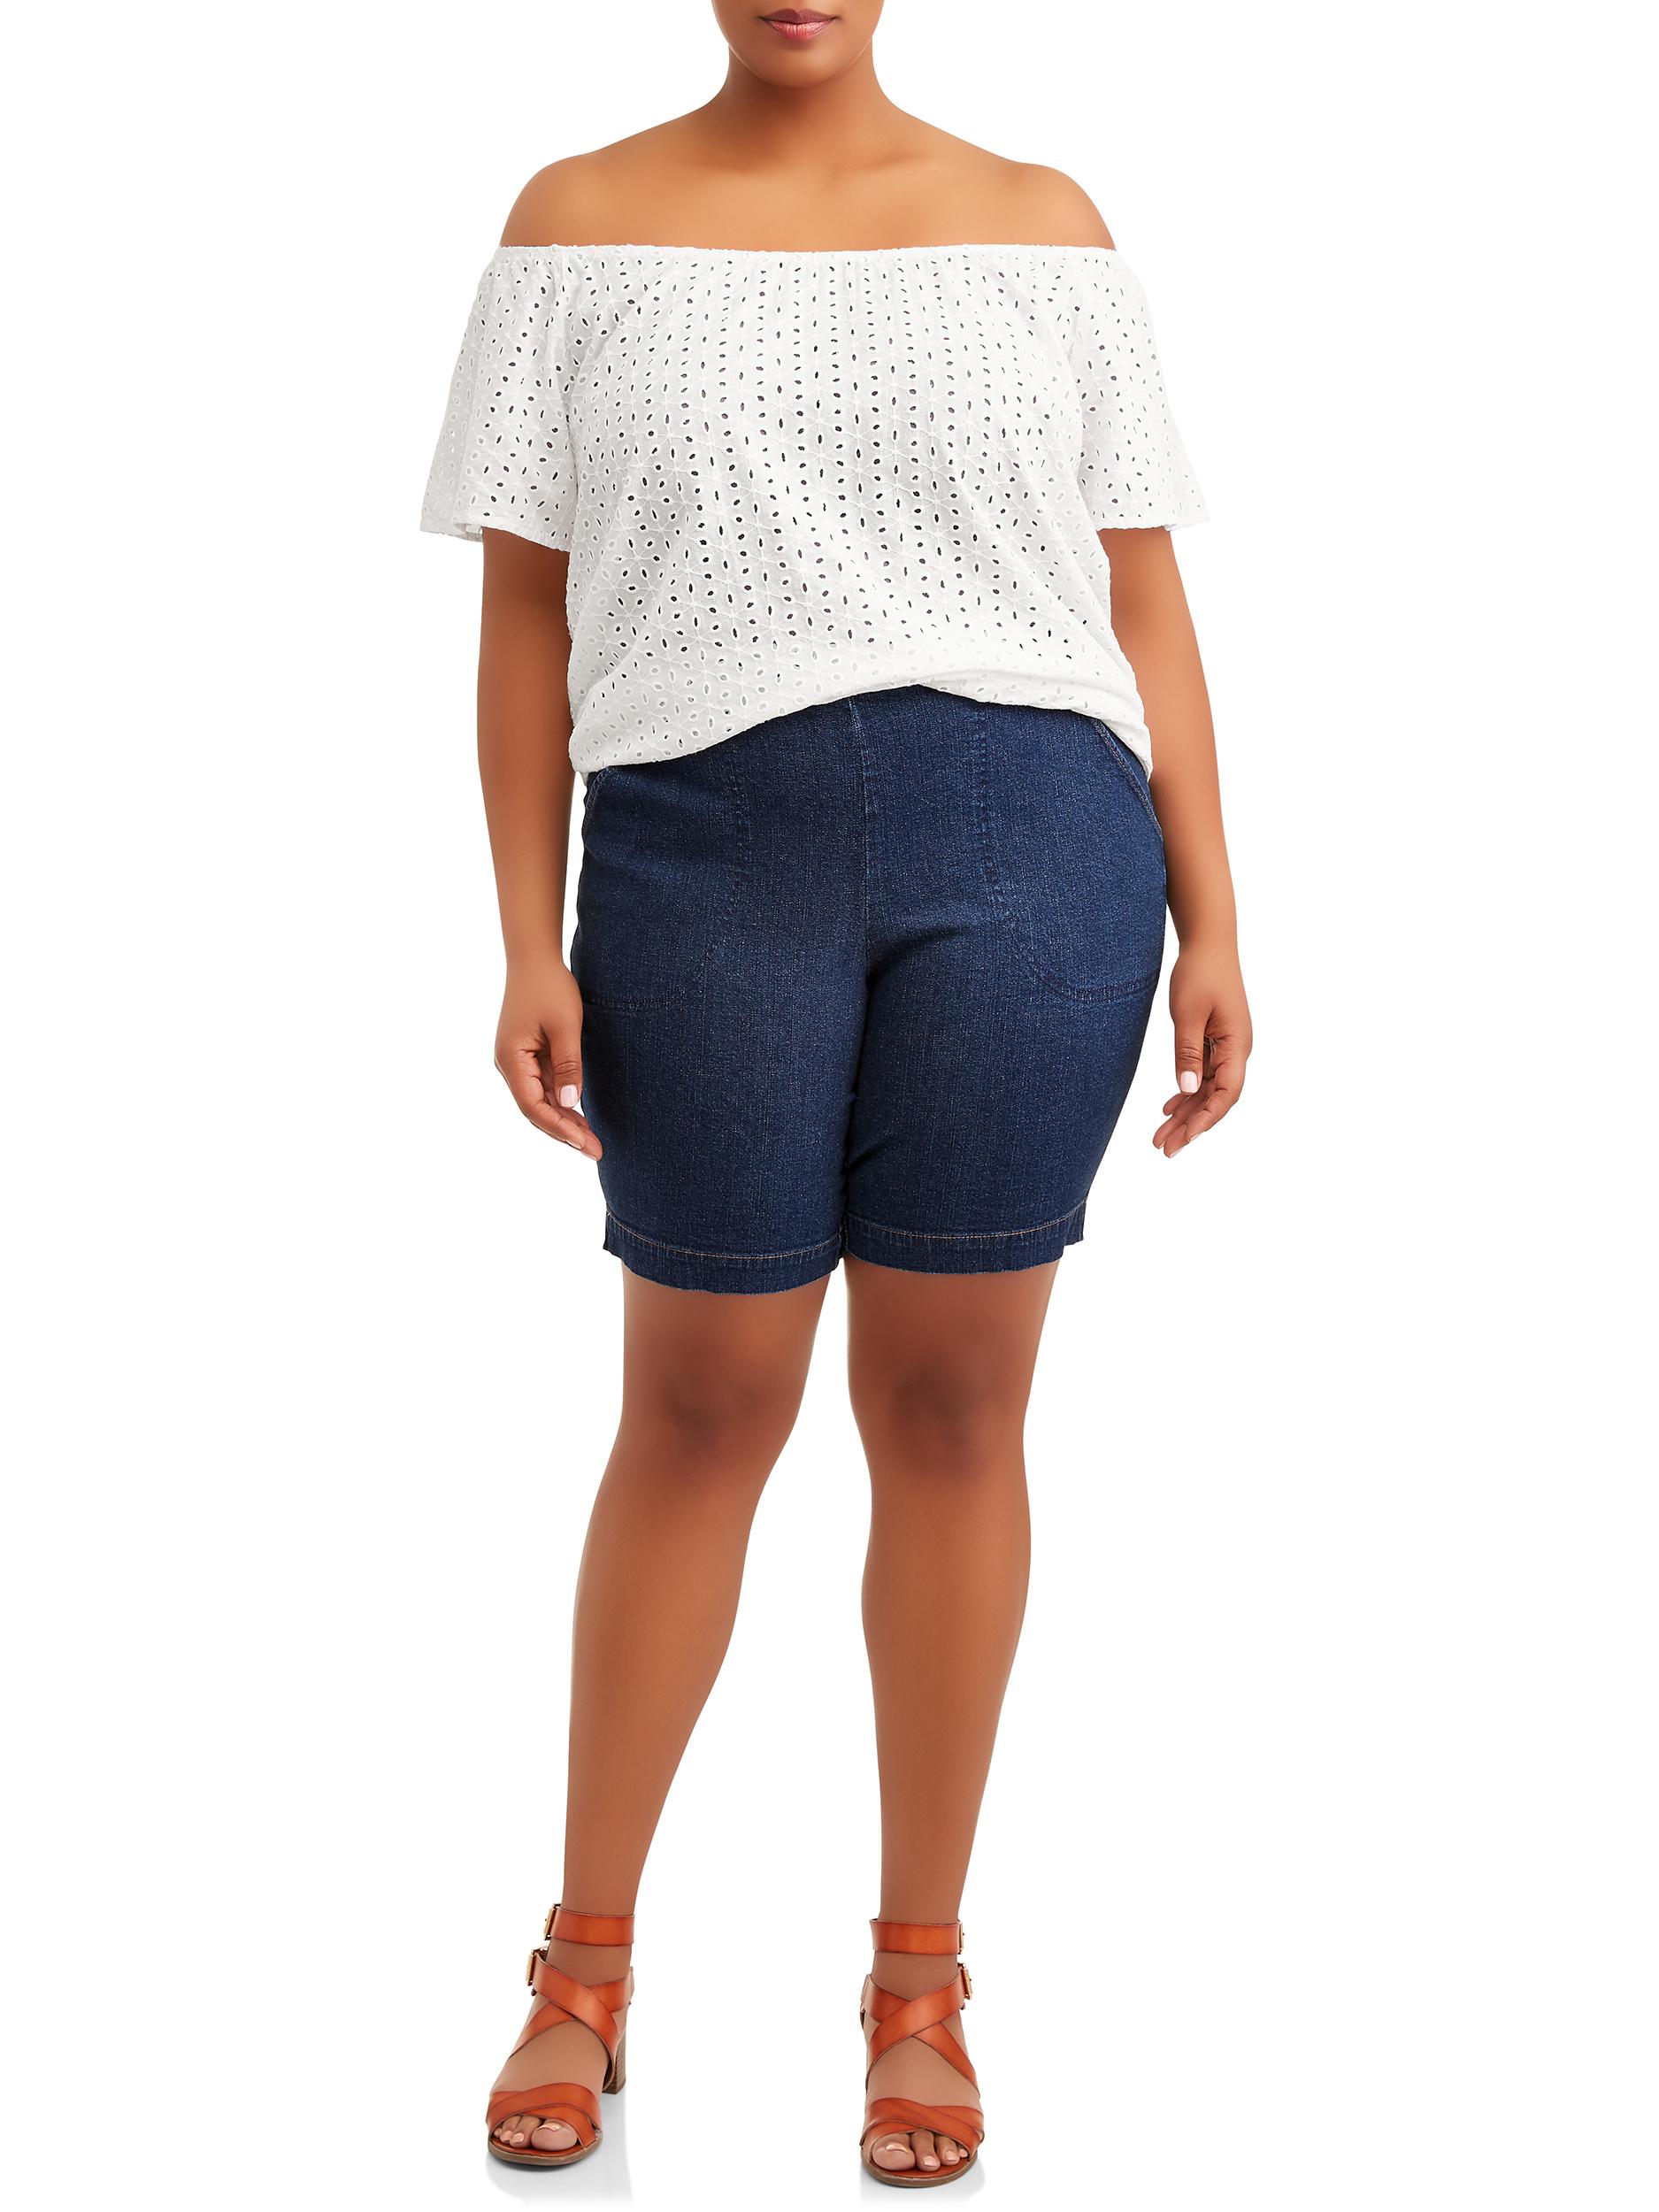 Plus size teen plaid bermuda shorts